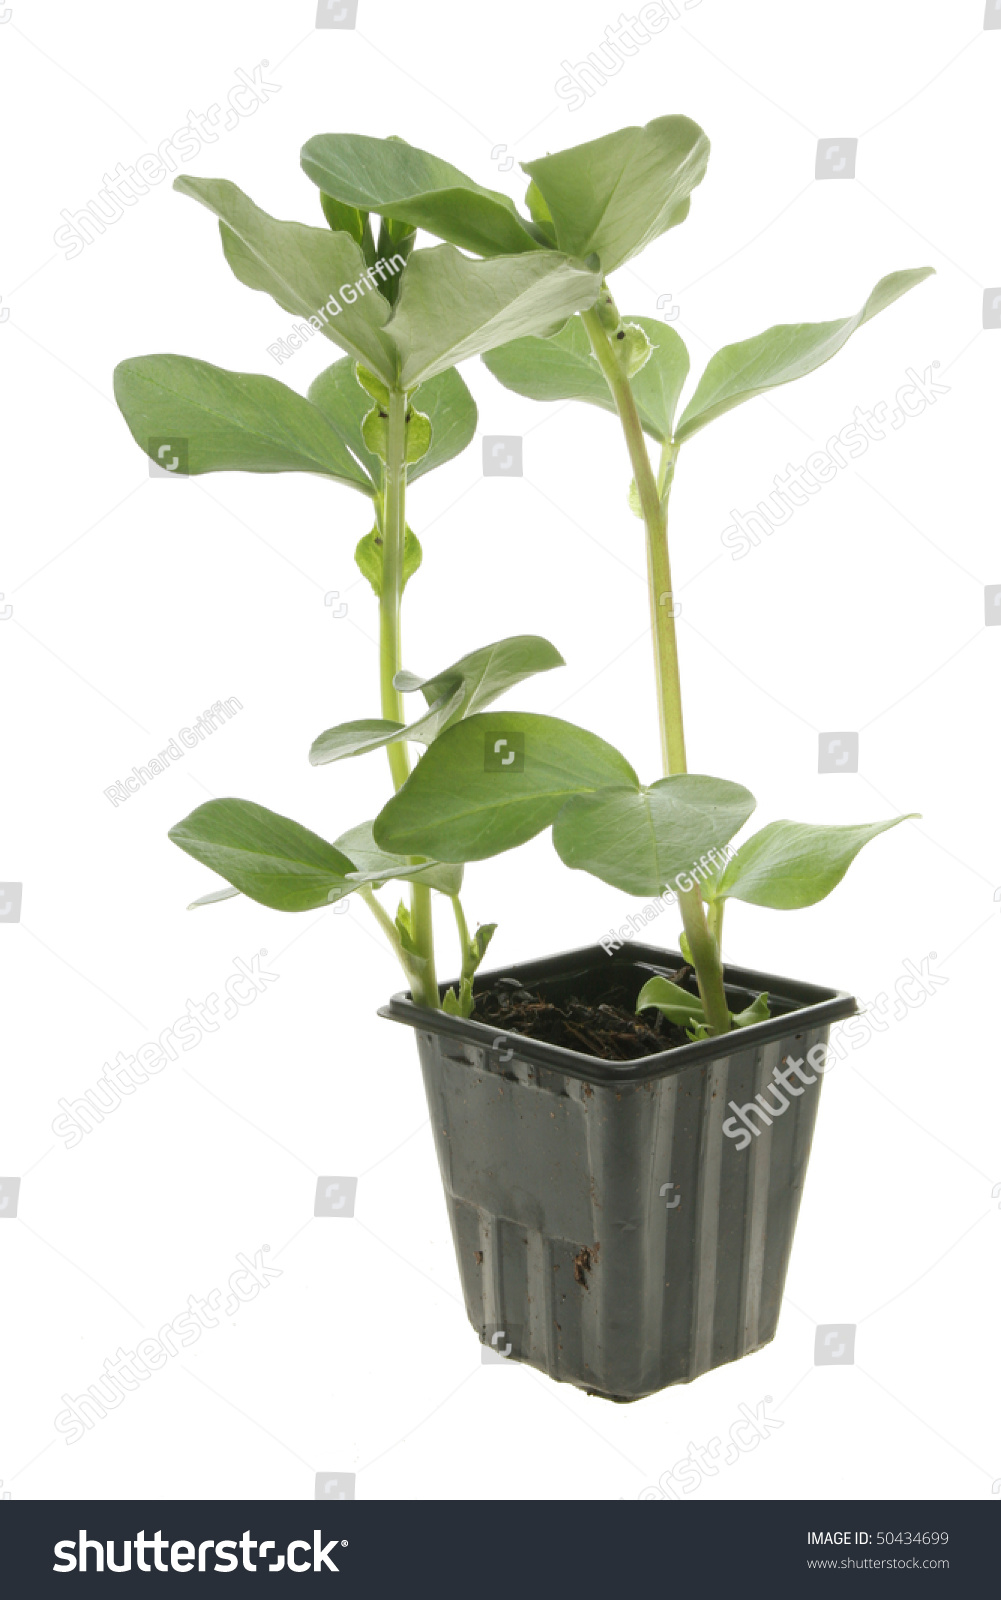 Young Broad Bean Plants Plastic Pot Stock Photo 50434699